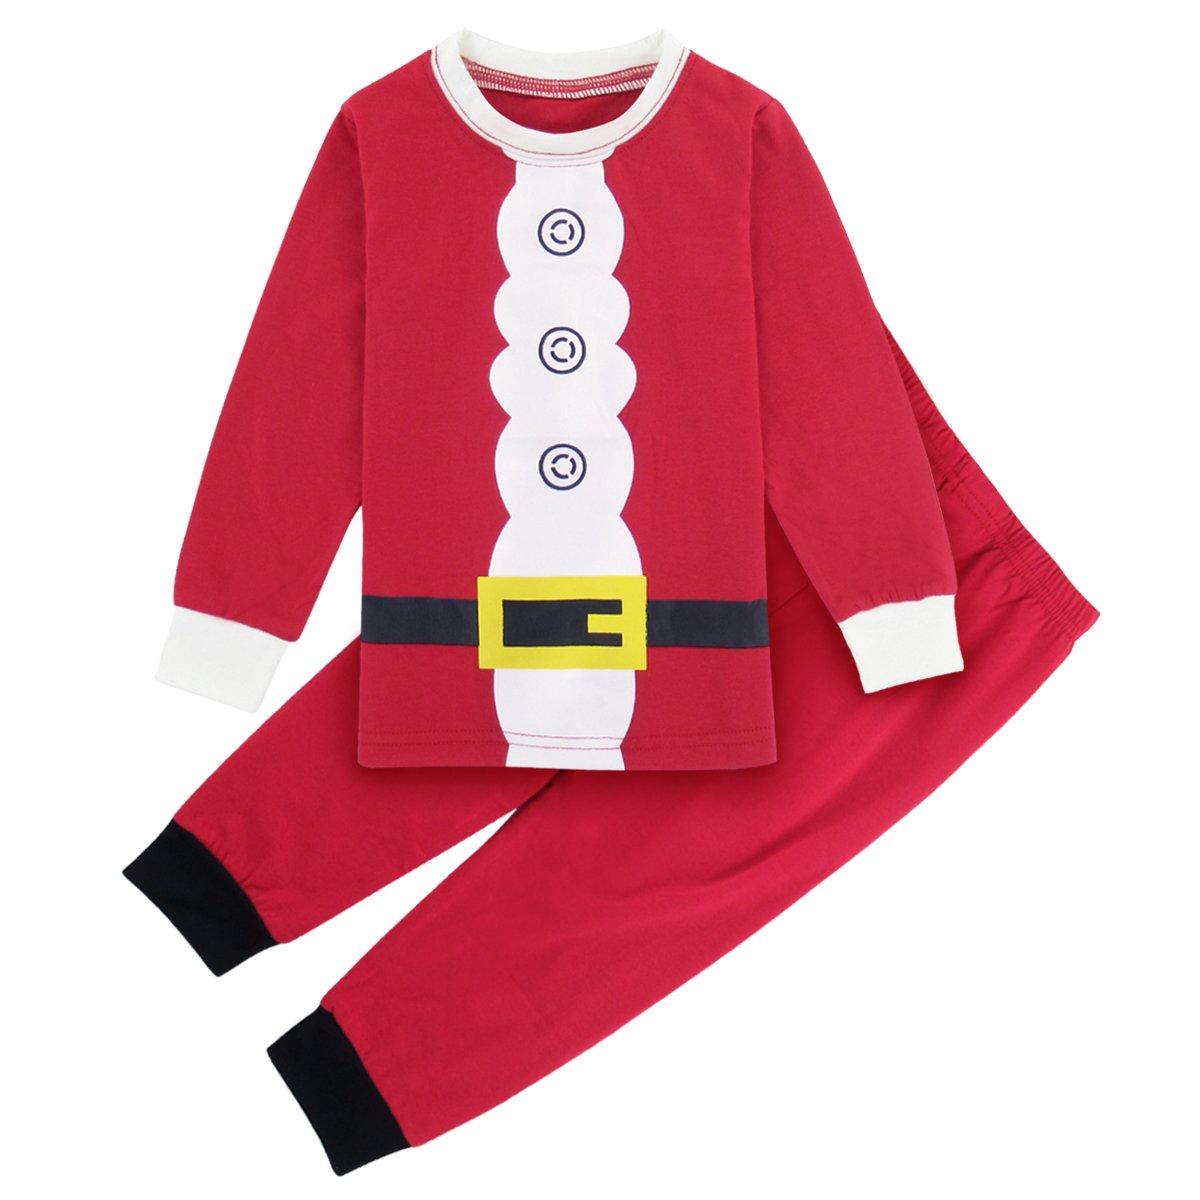 A& J Design Boys Girls Christmas Santa Claus Costume Pajamas Pjs 2 Piece Sets Red)